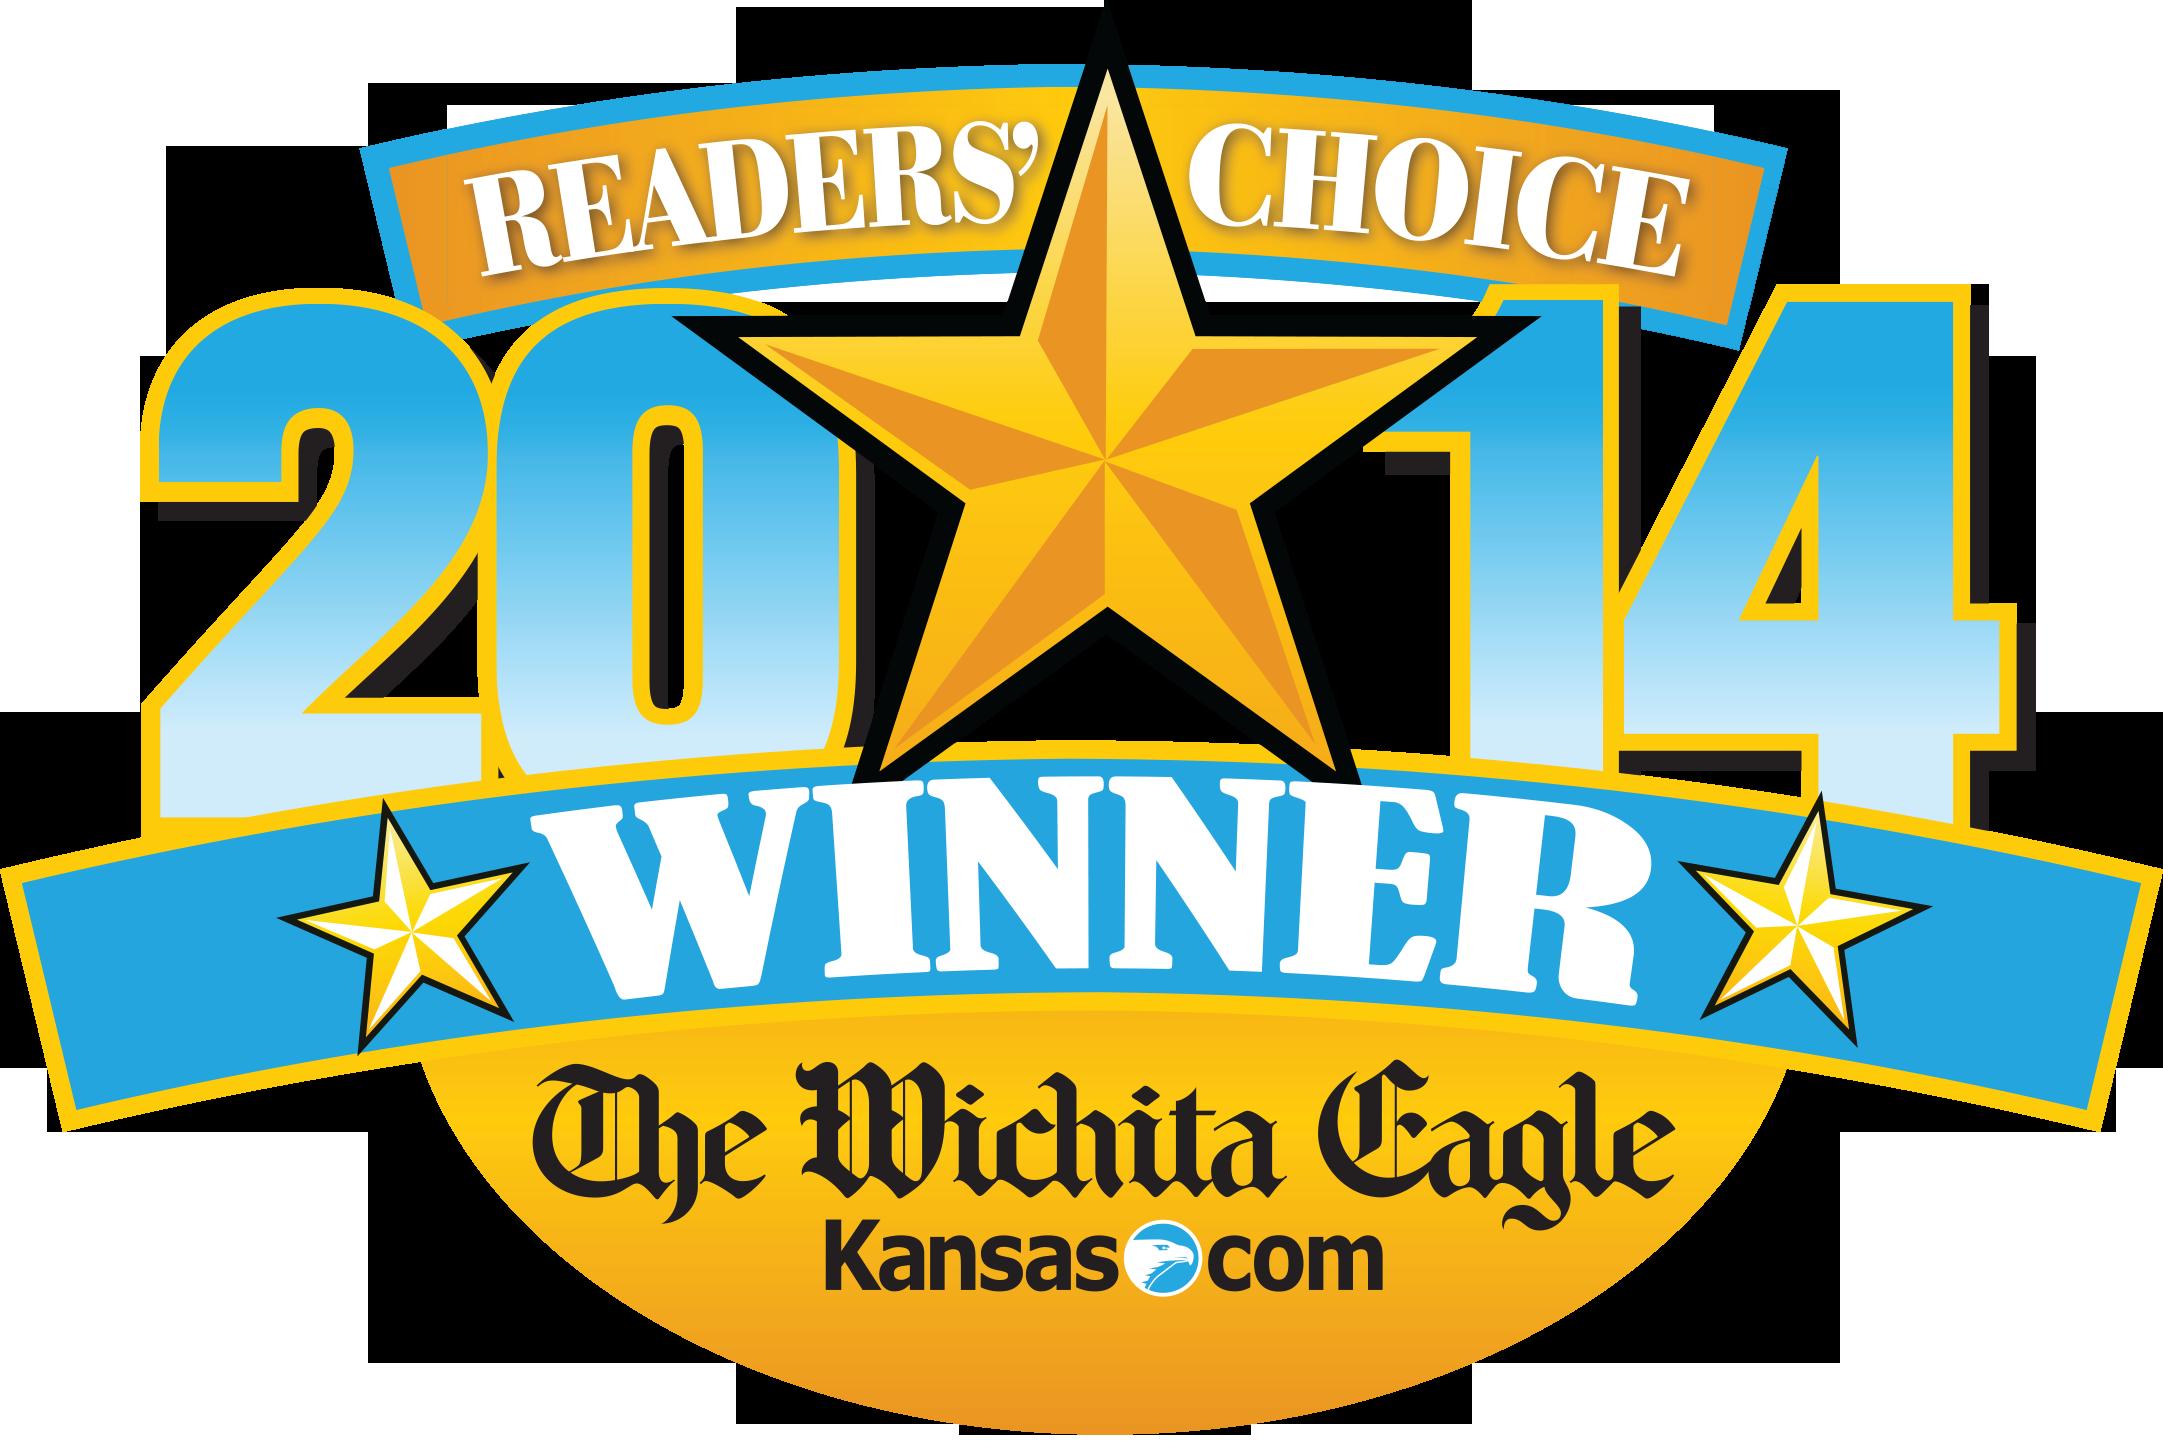 Wichita Eagle Readers Choice